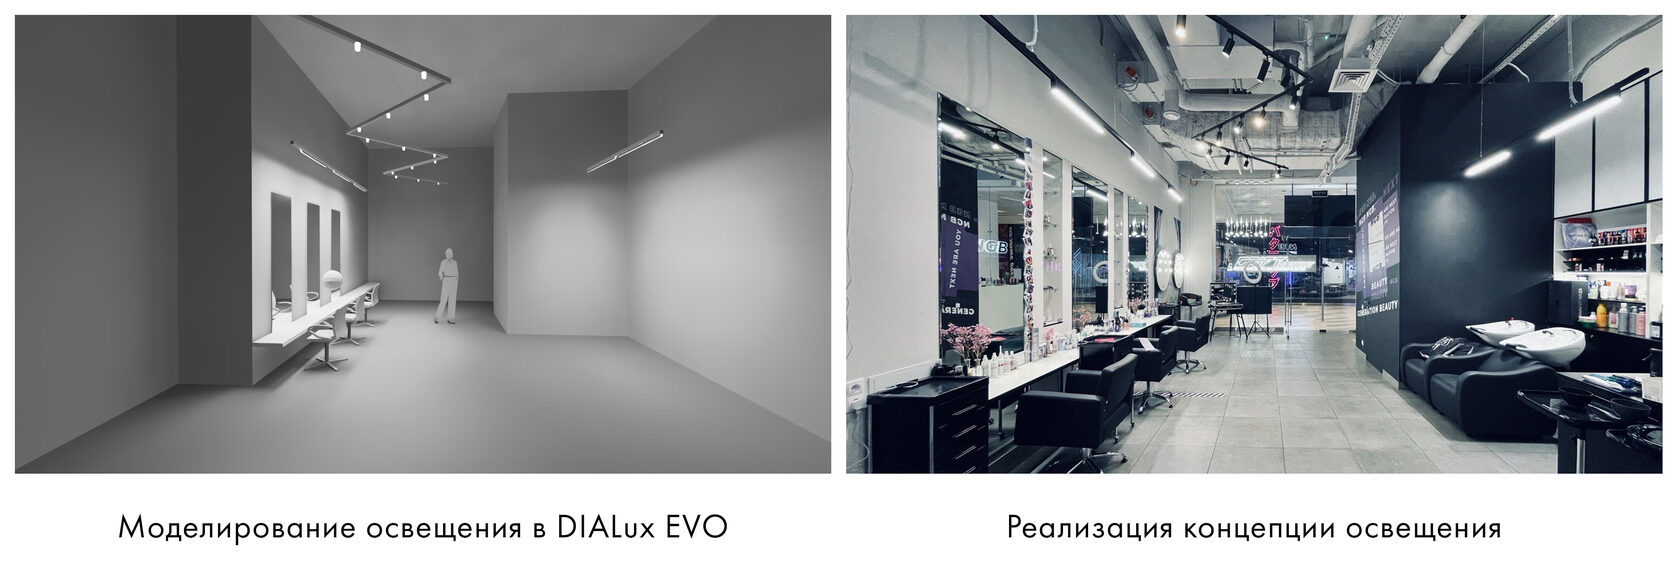 Соосветствие концепции освещения в DIALux EVO и реализации